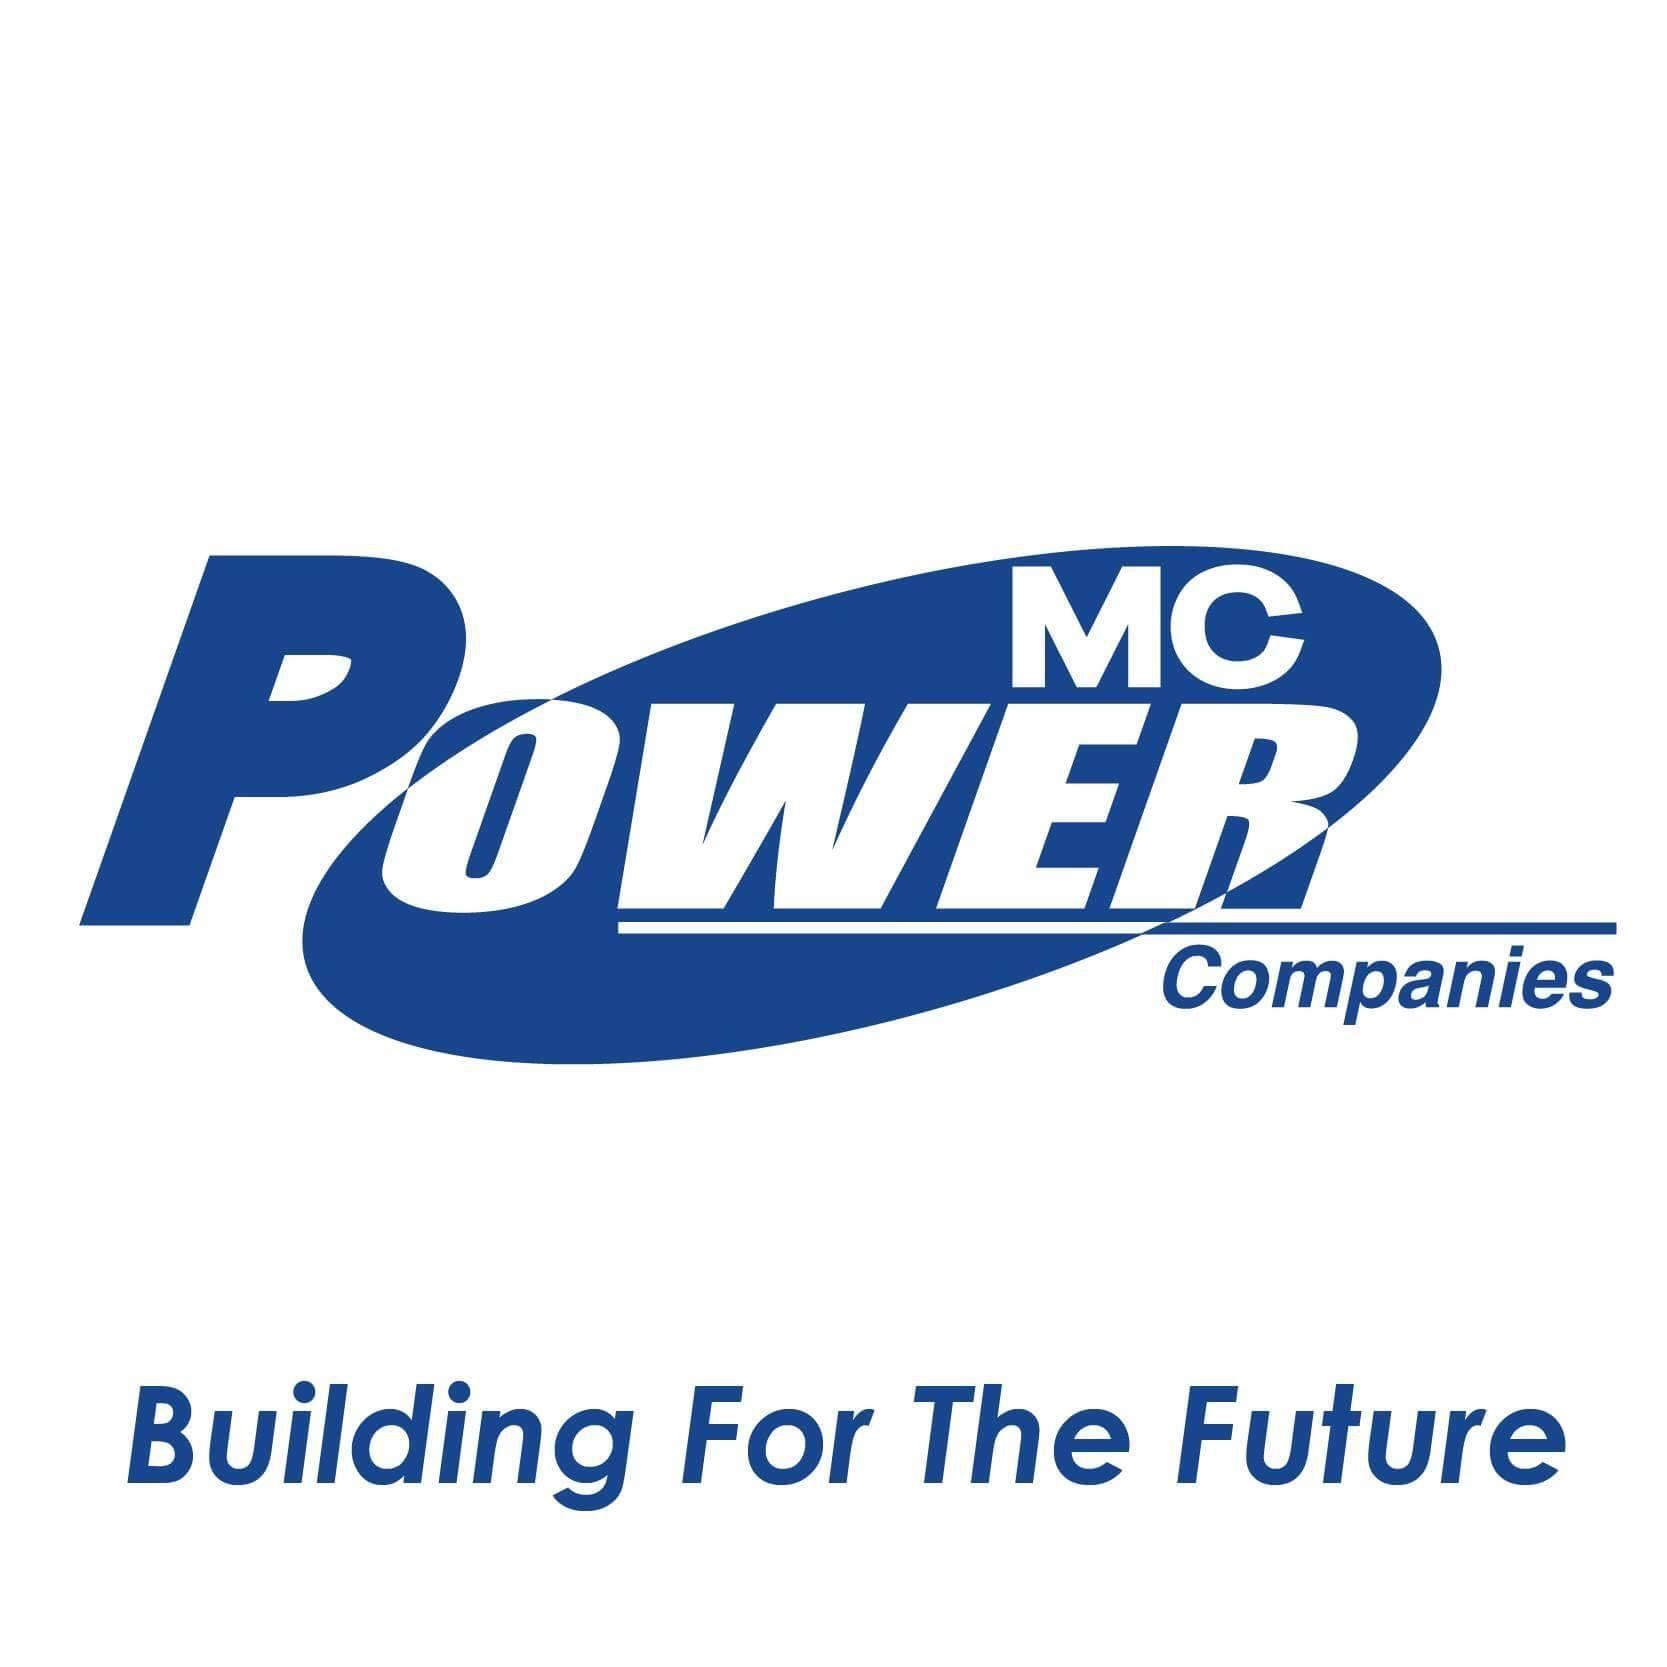 MC Power Companies